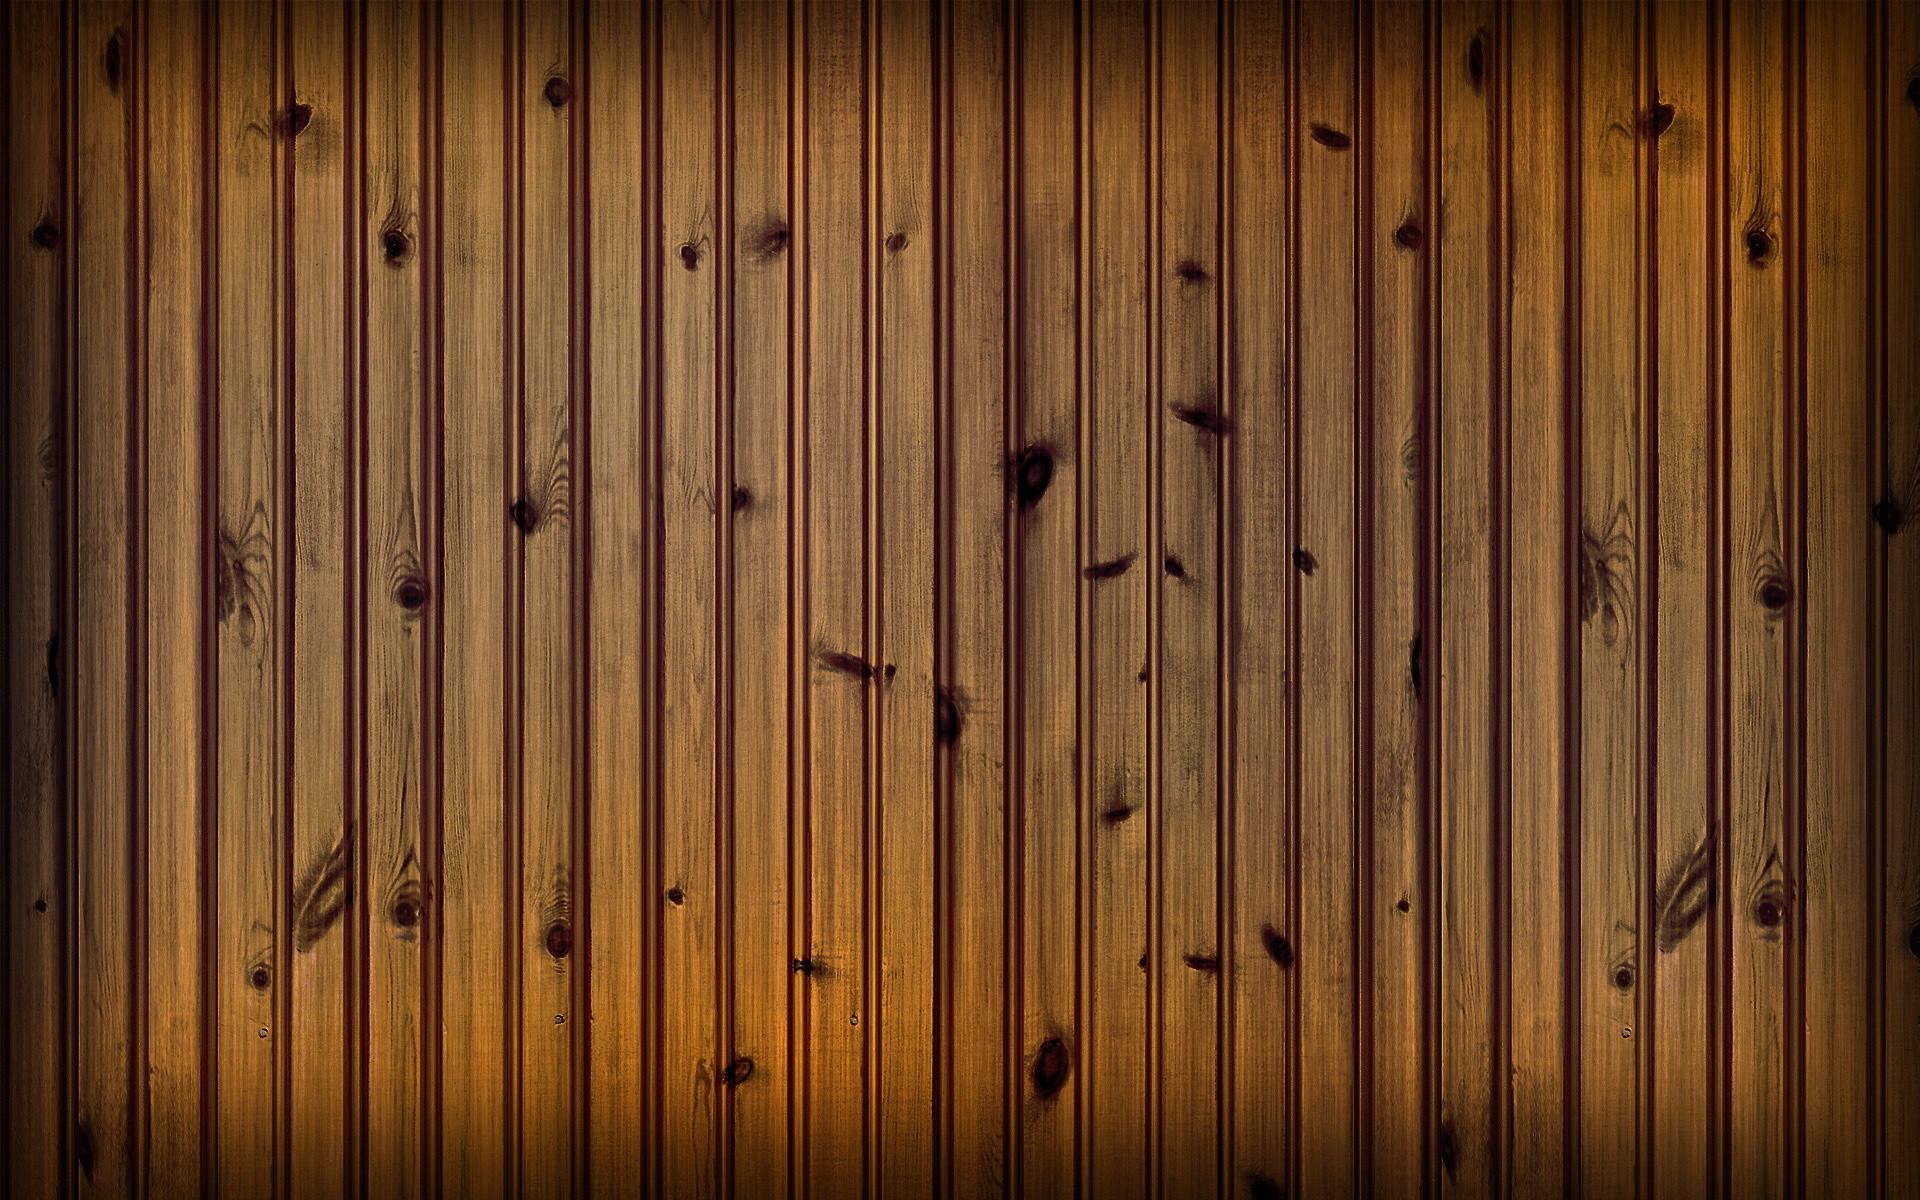 High Quality Wood Wallpaper